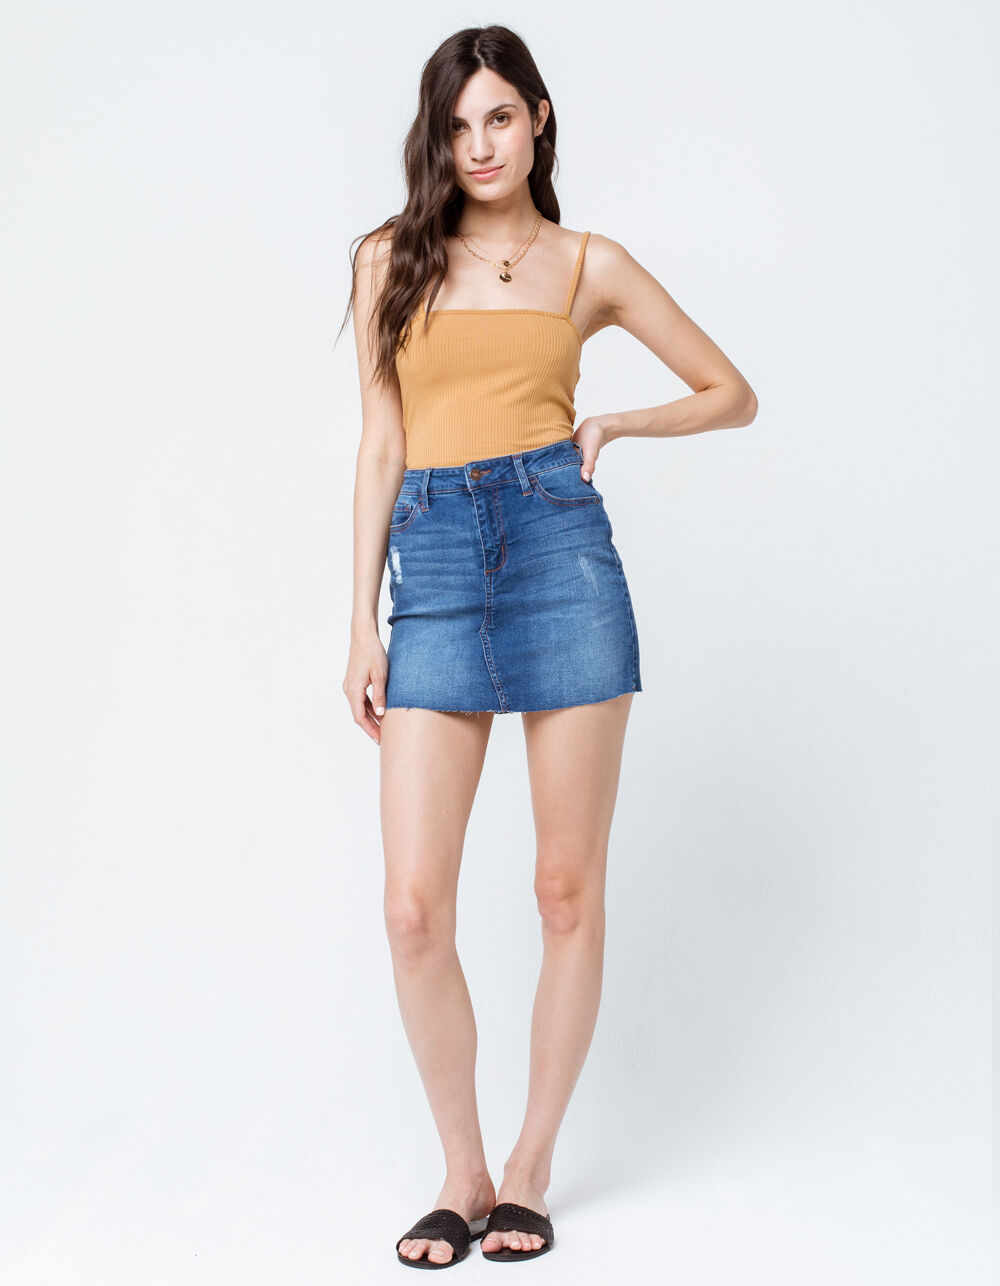 SKY AND SPARROW Ripped Denim Mini Skirt